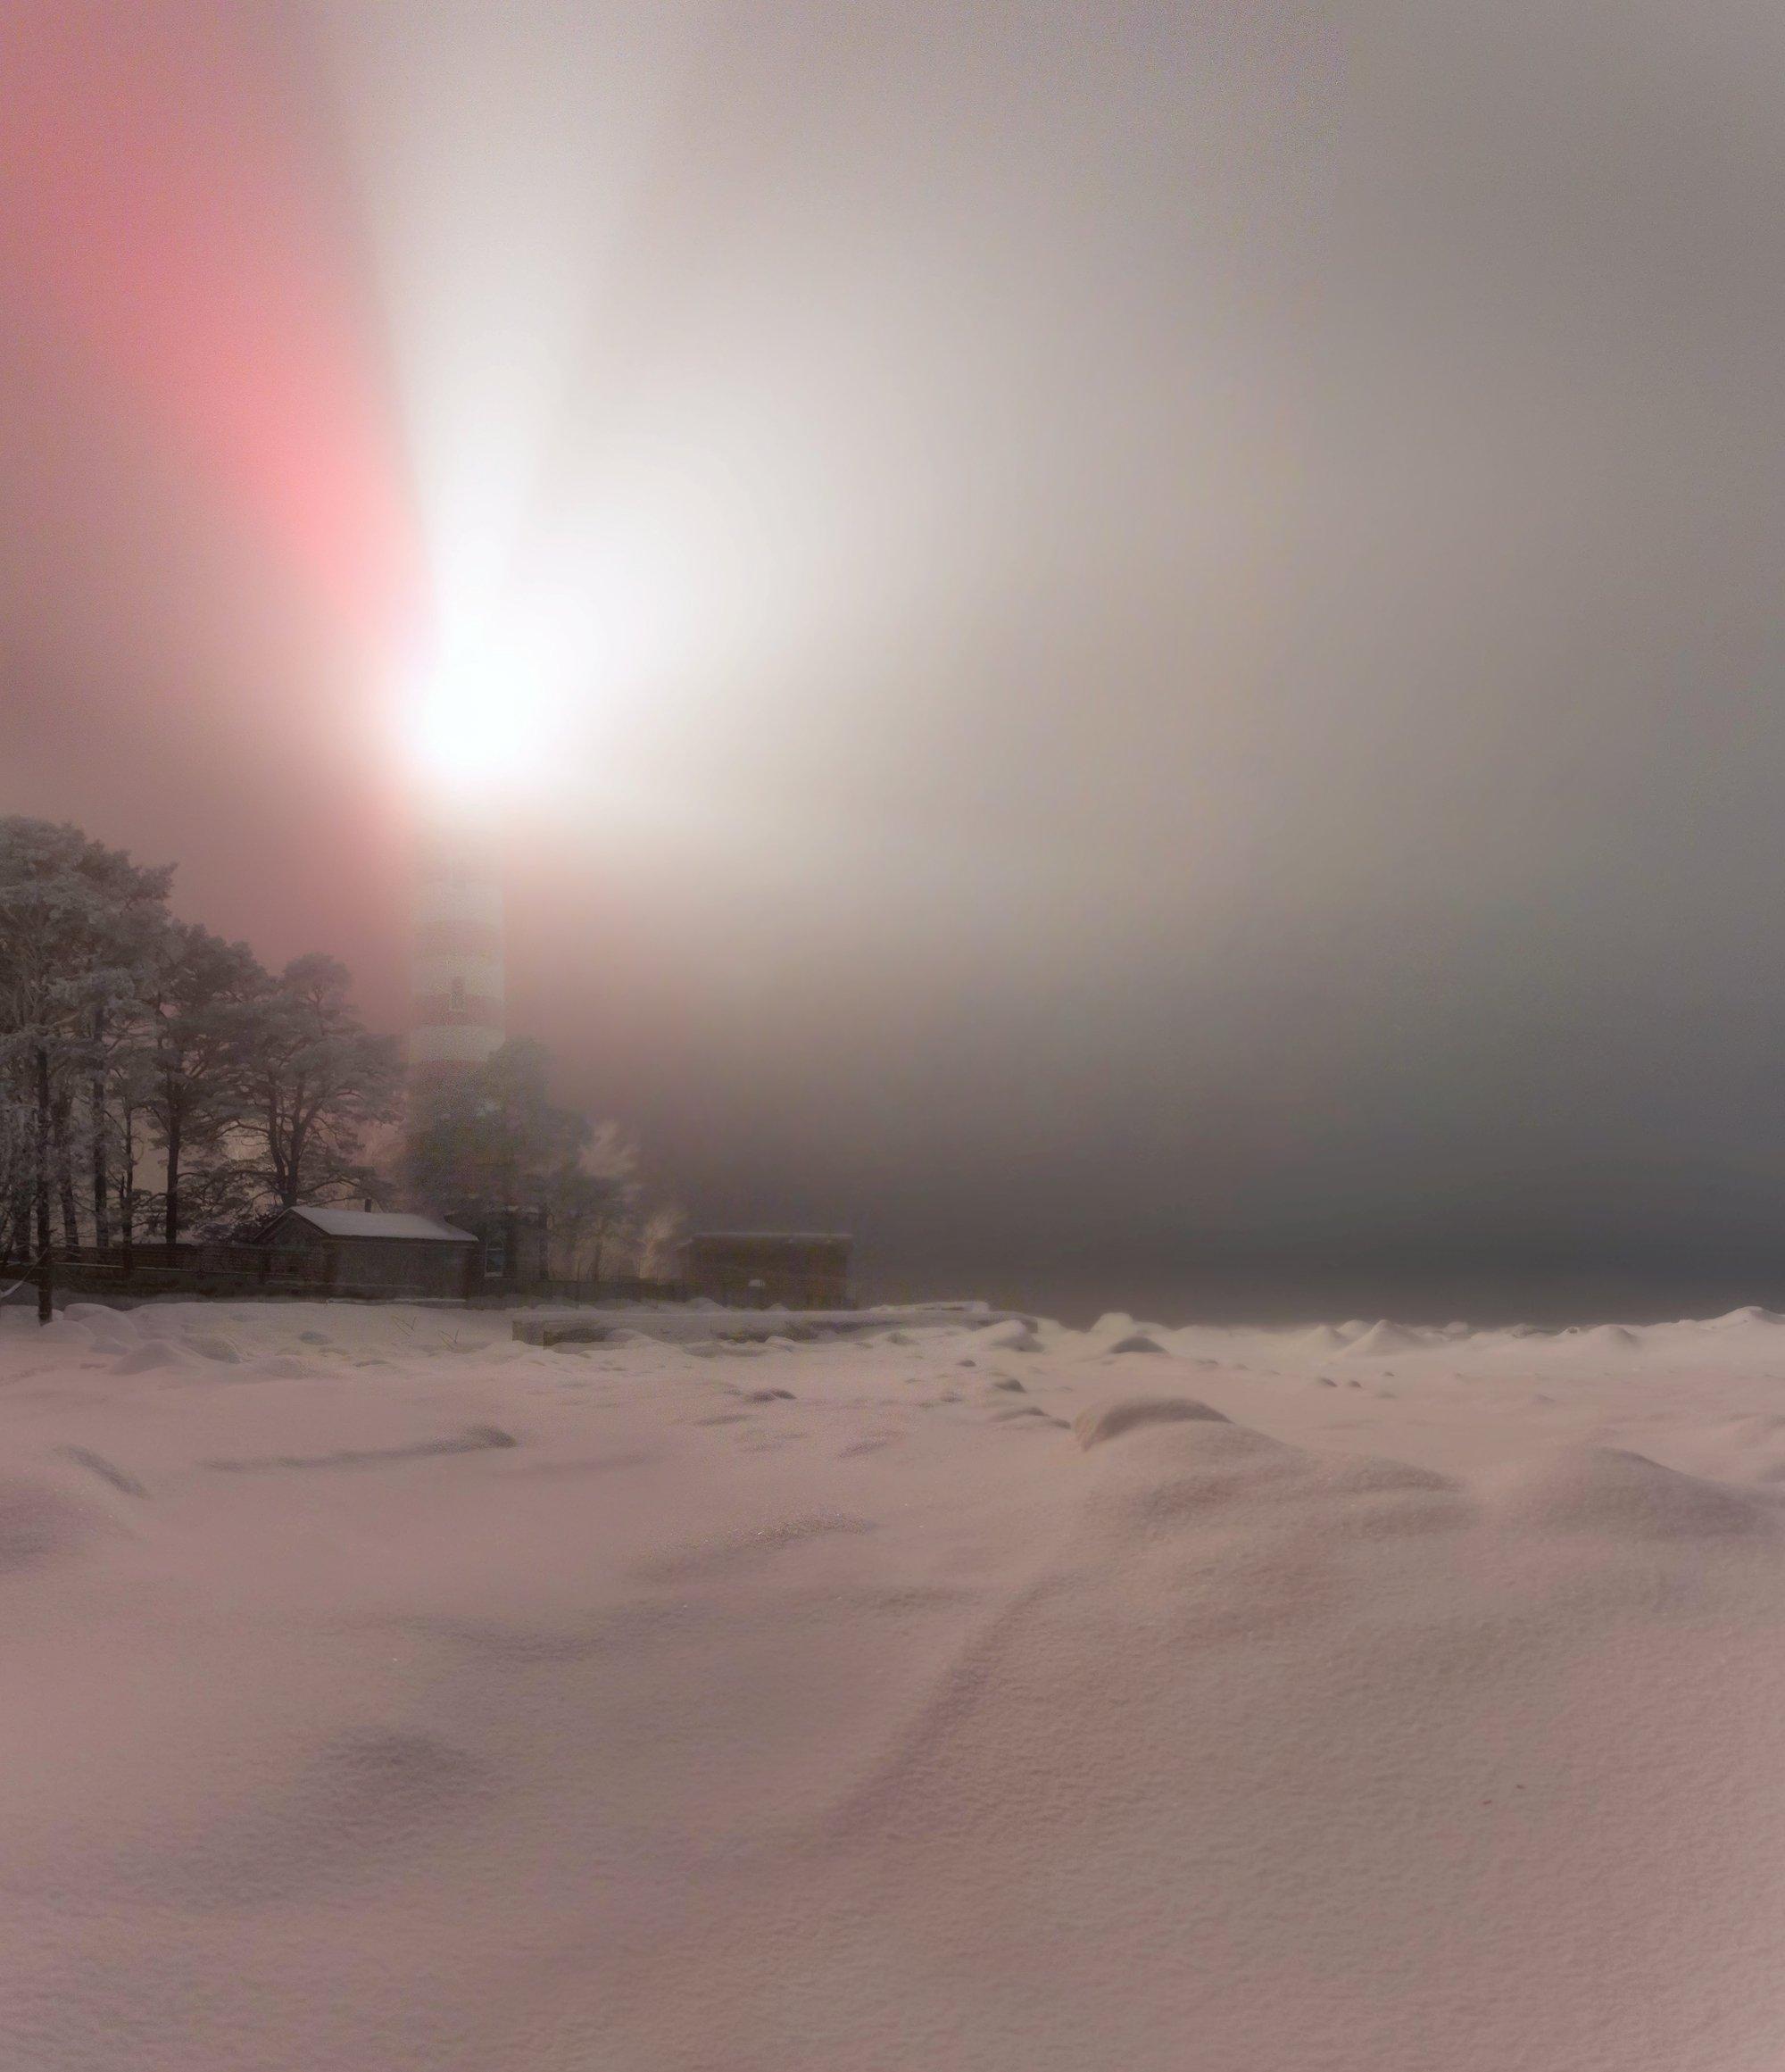 маяк, туман, зима, Vaschenkov Pavel